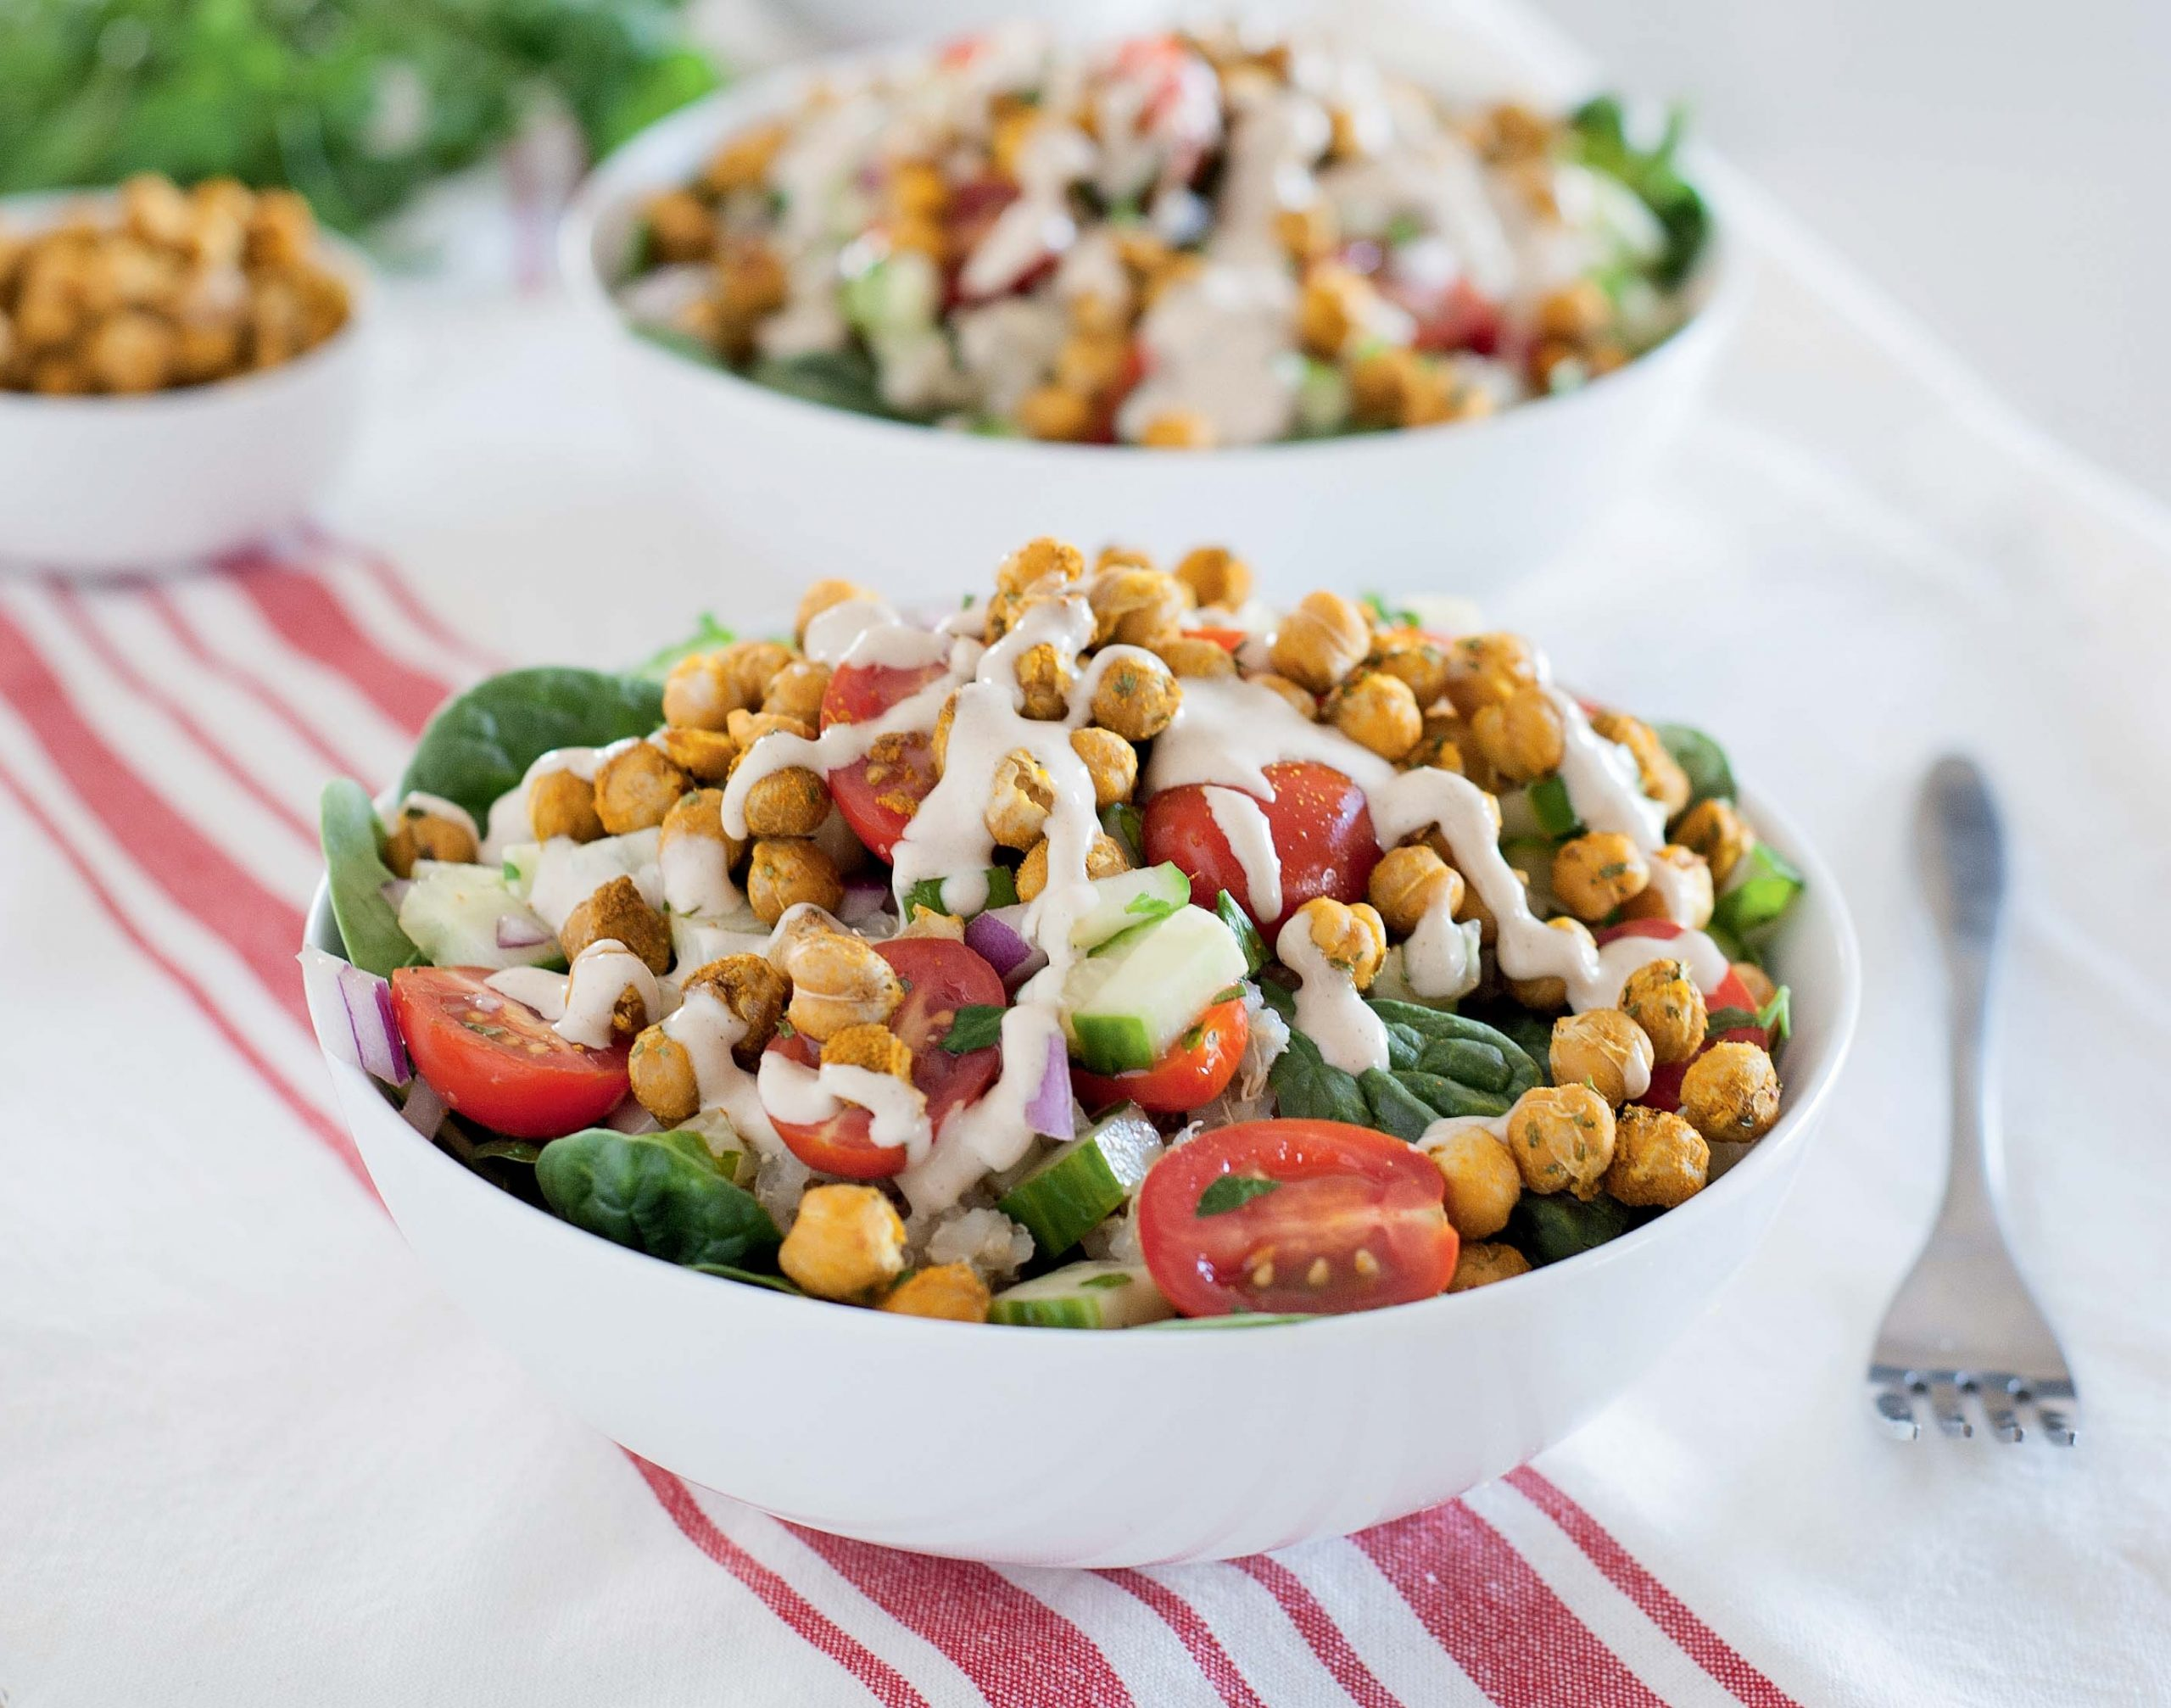 Mediterranean Quinoa Bowls with Roasted Chickpeas